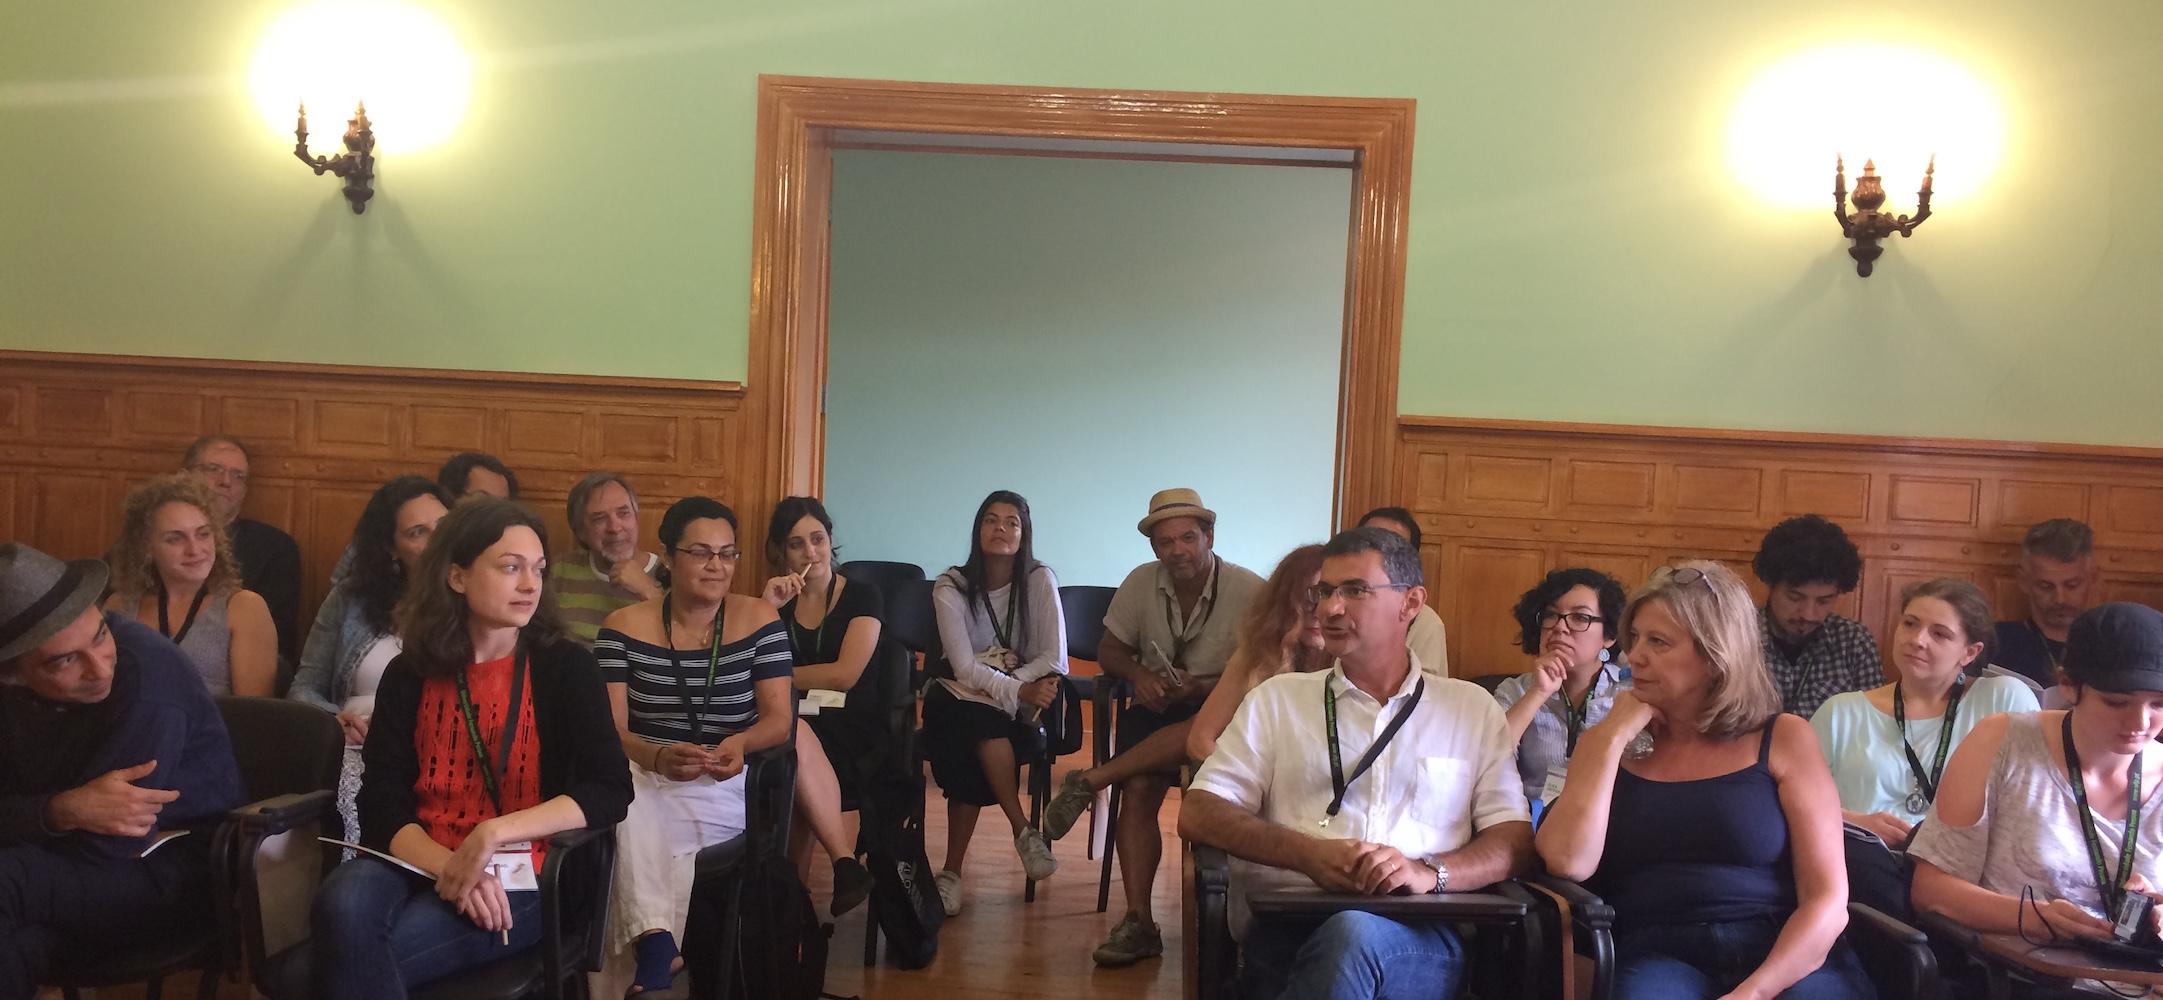 Actas de reunión litElat en ELO Porto